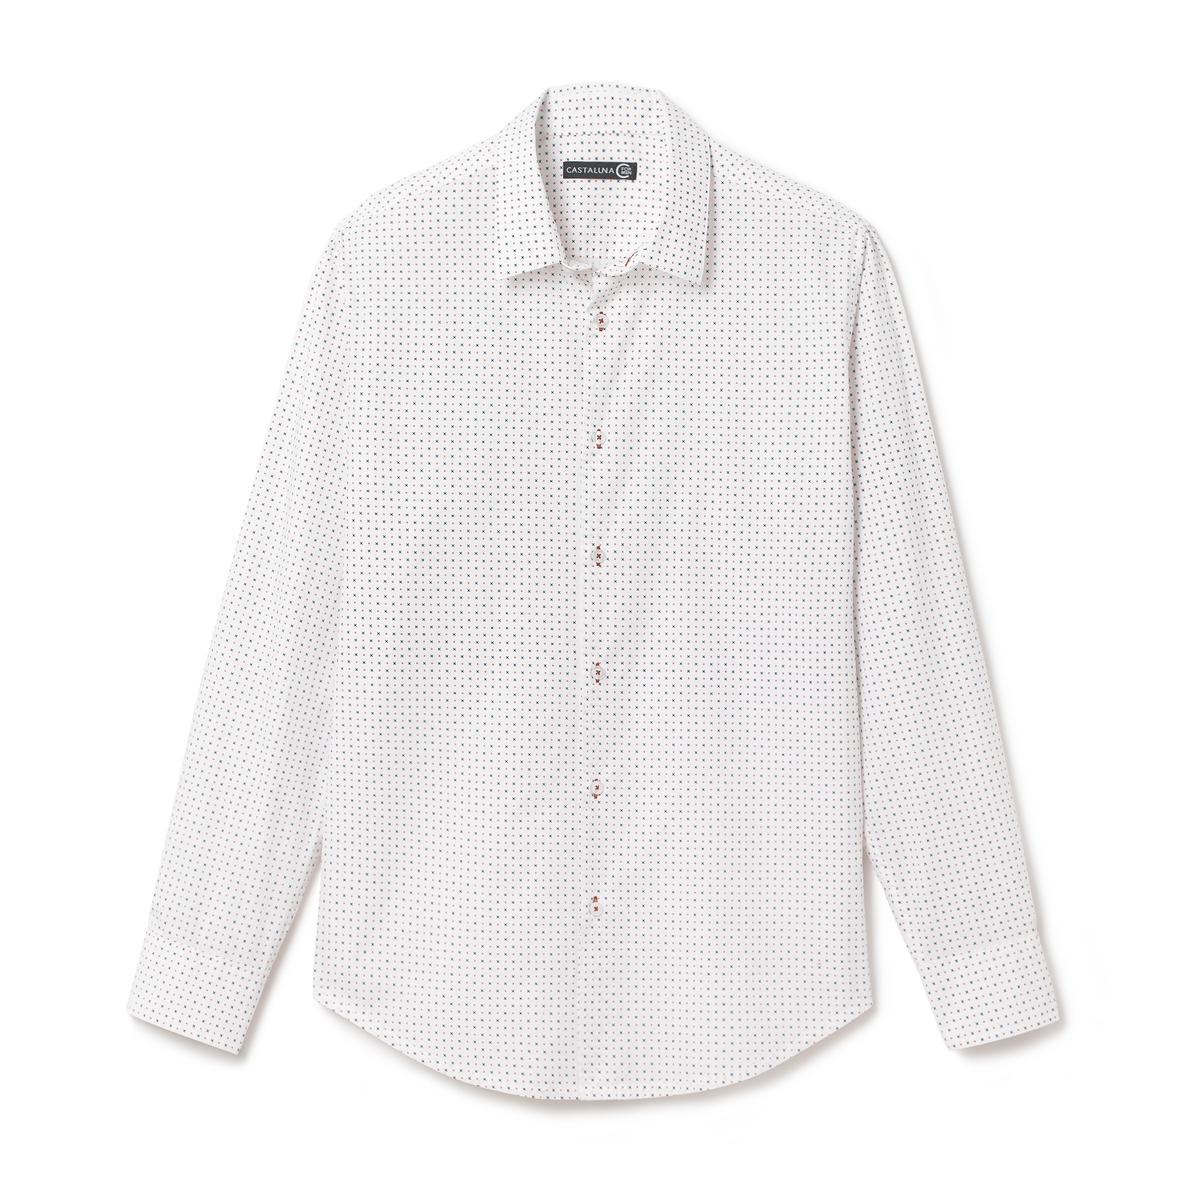 Рубашка с рисунком приталенного покроя